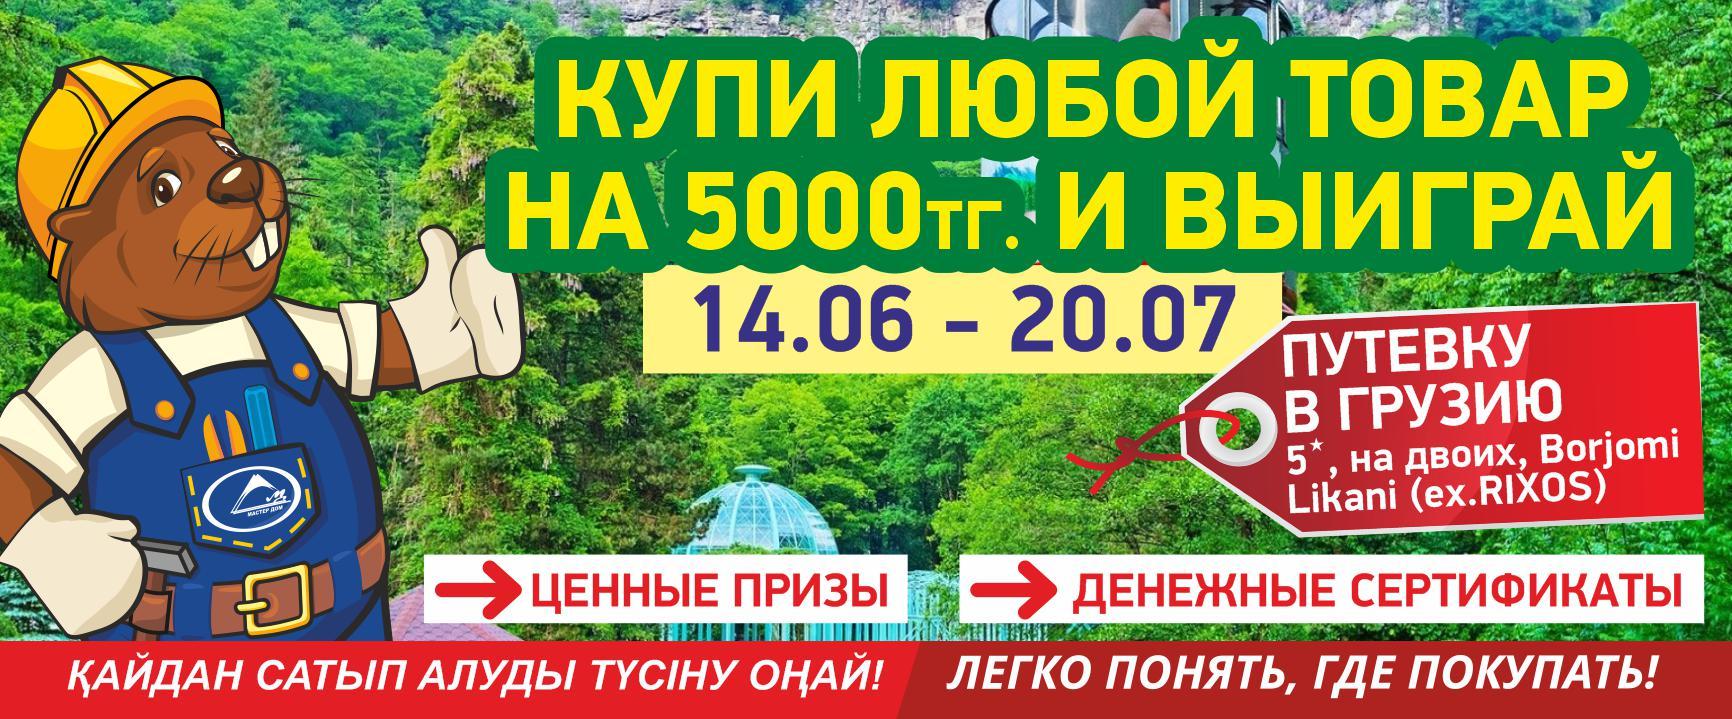 rozygrysh_062021